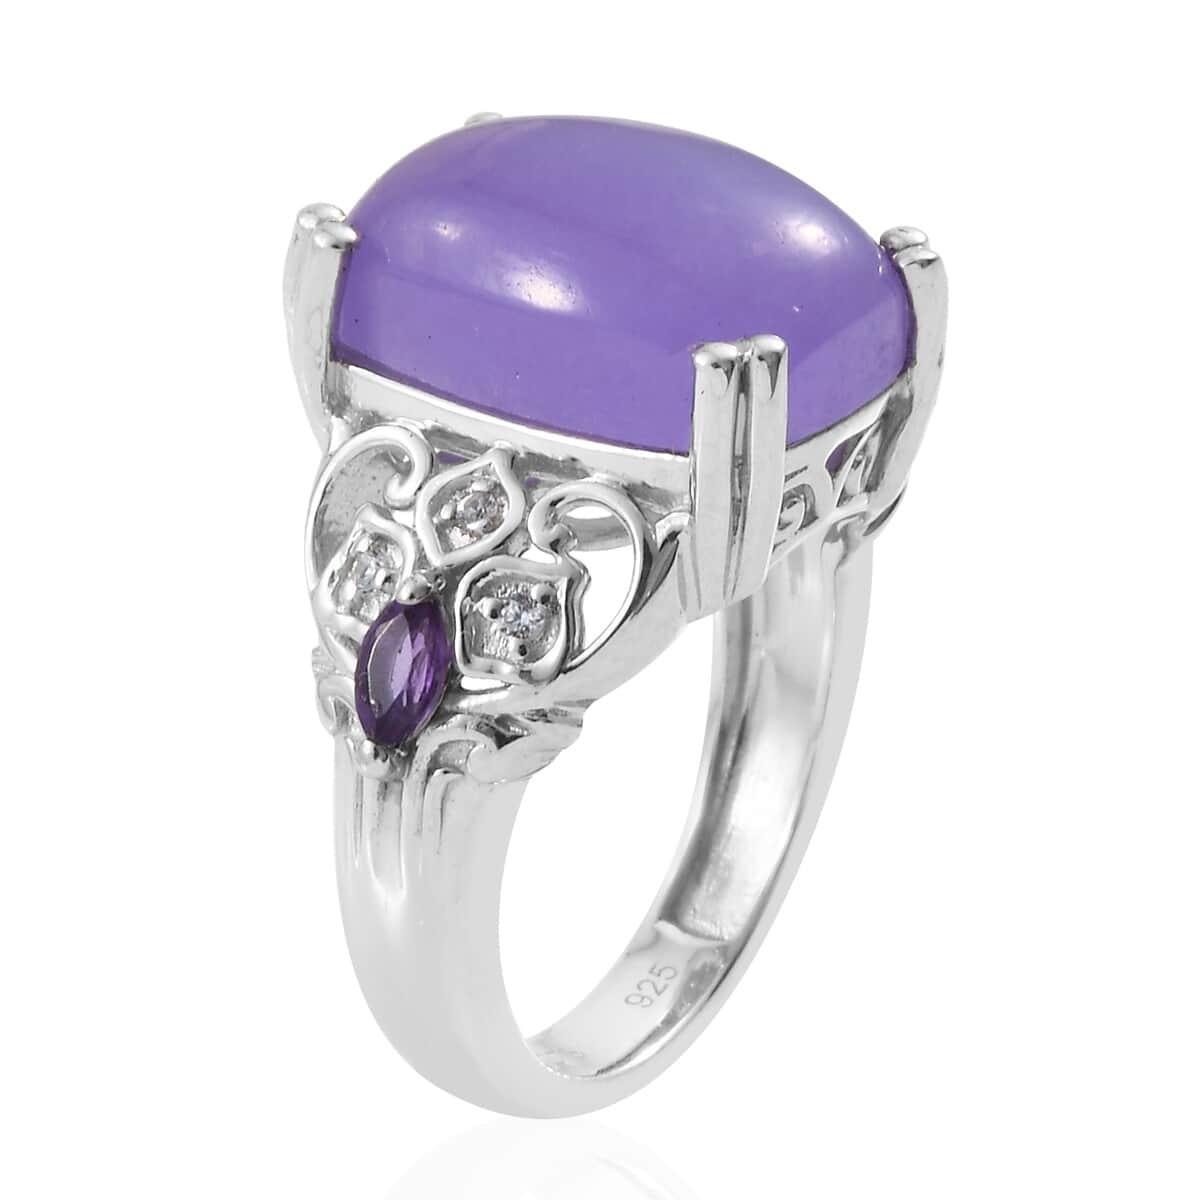 Burmese Purple Jade, Multi Gemstone Ring in Platinum Over Sterling Silver (Size 5.0) 9.00 ctw